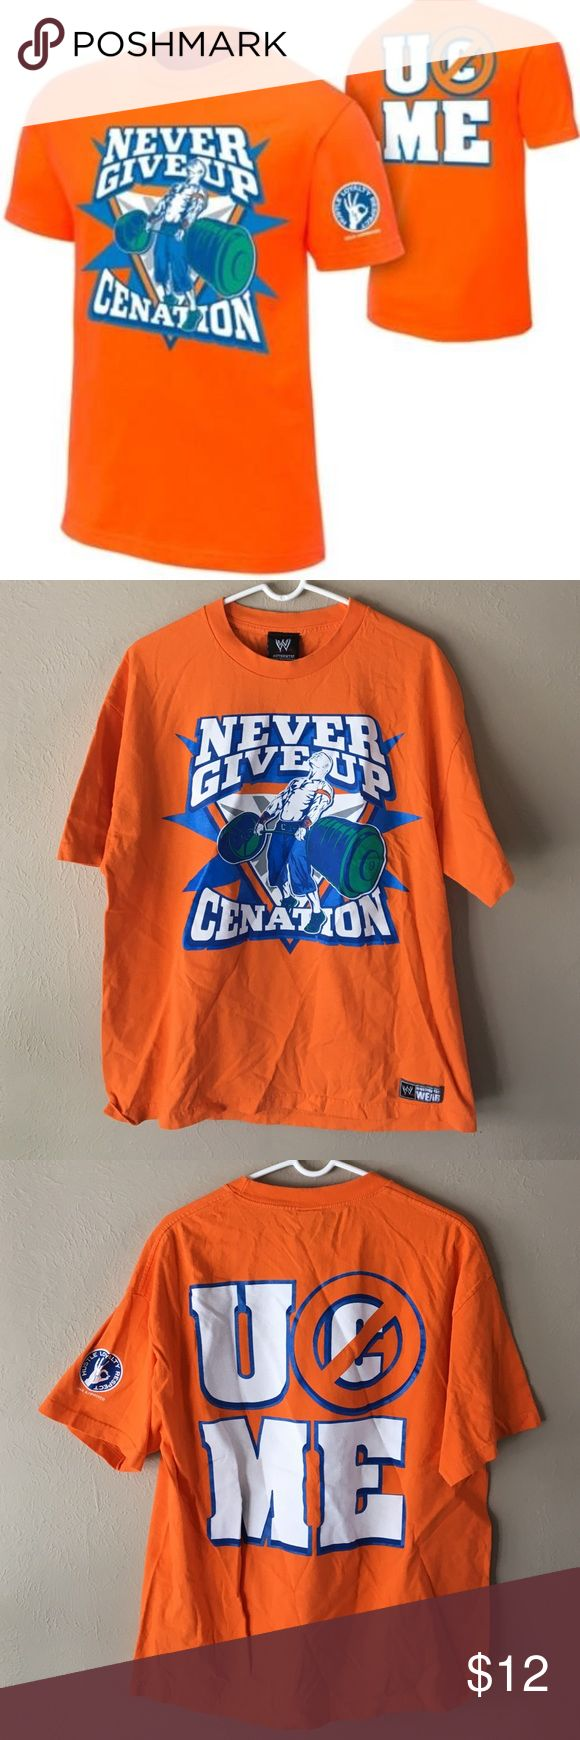 WWE John Cena orange t-shirt WWE John Cena wrestling short sleeve t-shirt. Bright orange color with graphics on both sides. Size XL. Worn once, like new. $19 retail plus $4.95 shipping online. WWE Shirts Tees - Short Sleeve